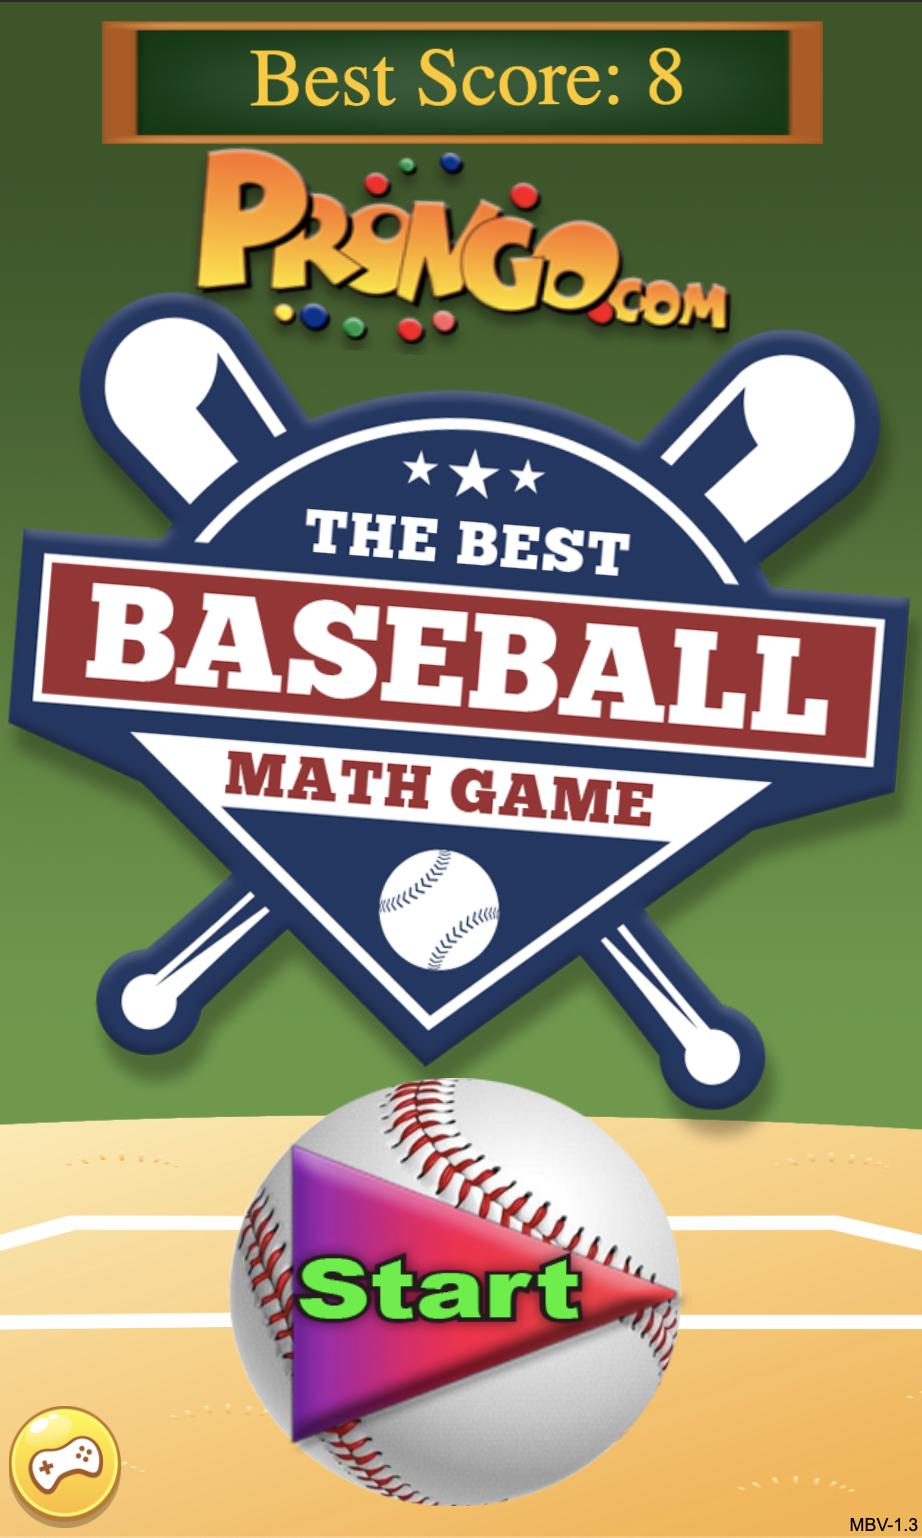 The Best Baseball Math Game